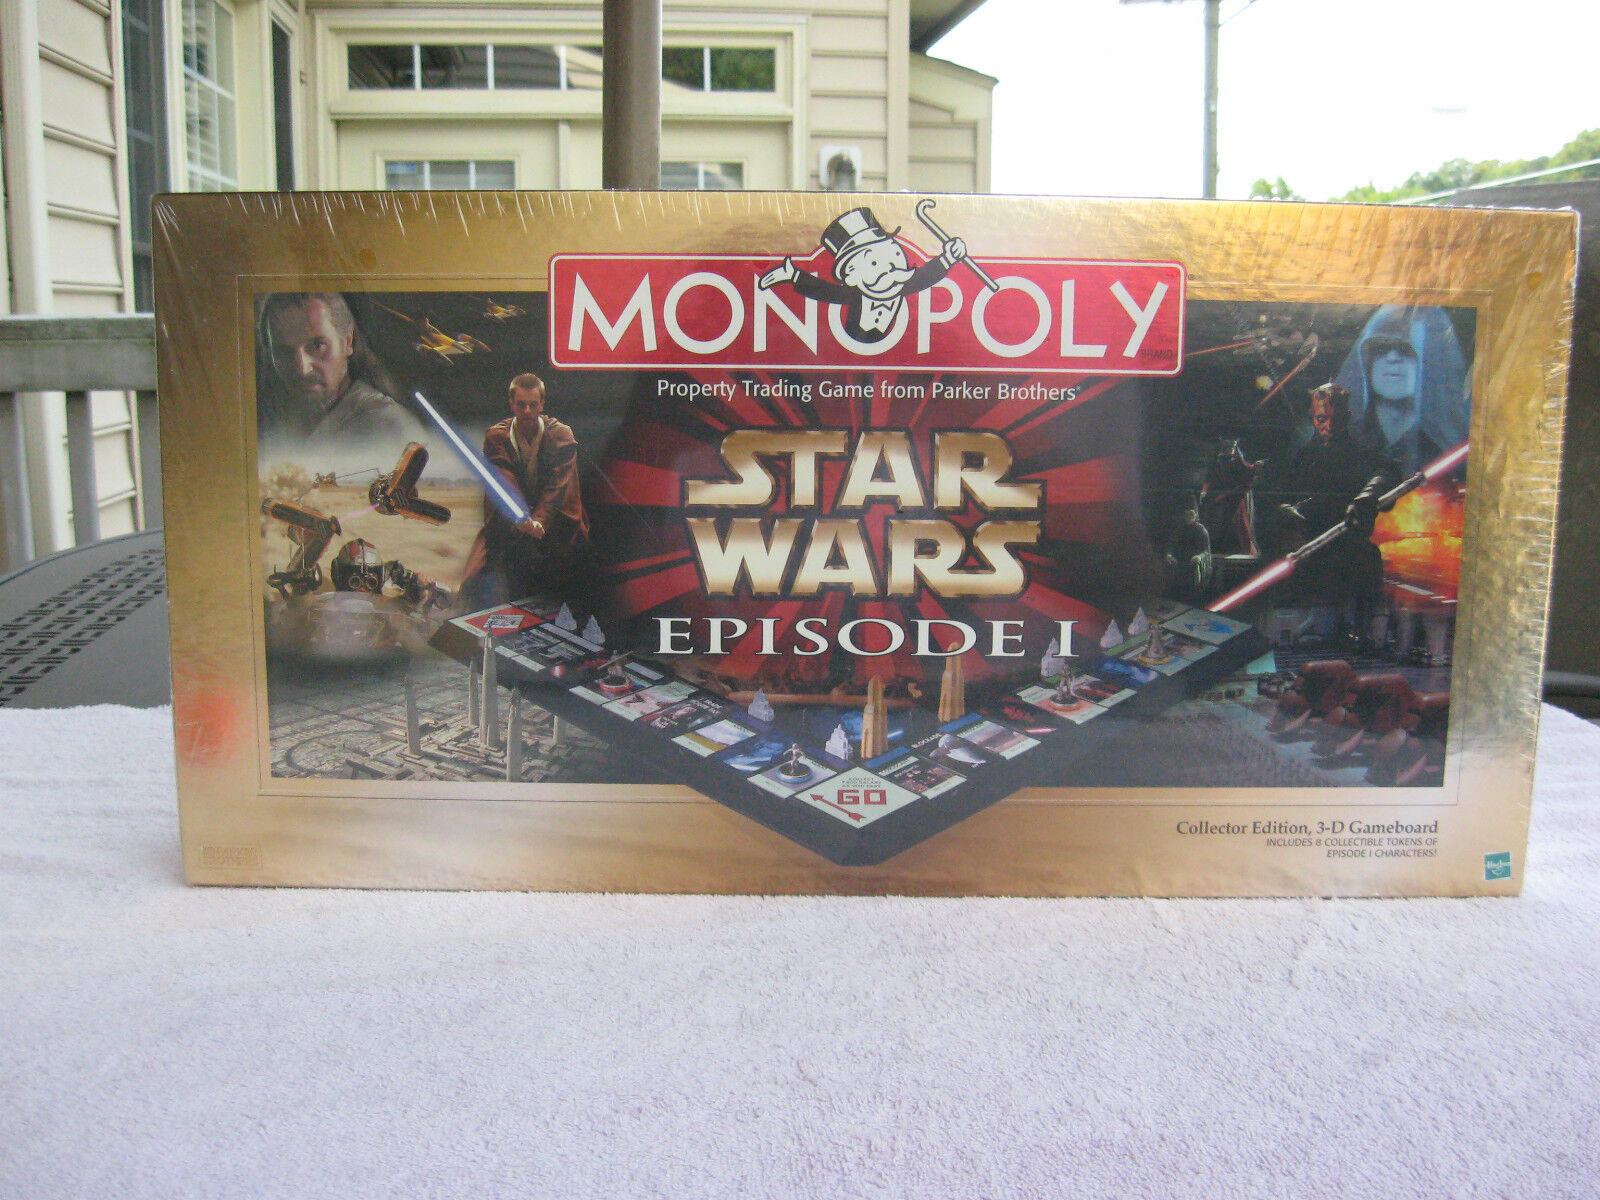 Monopol star wars episode 1 collectors edition 1999 - fabrik versiegelt